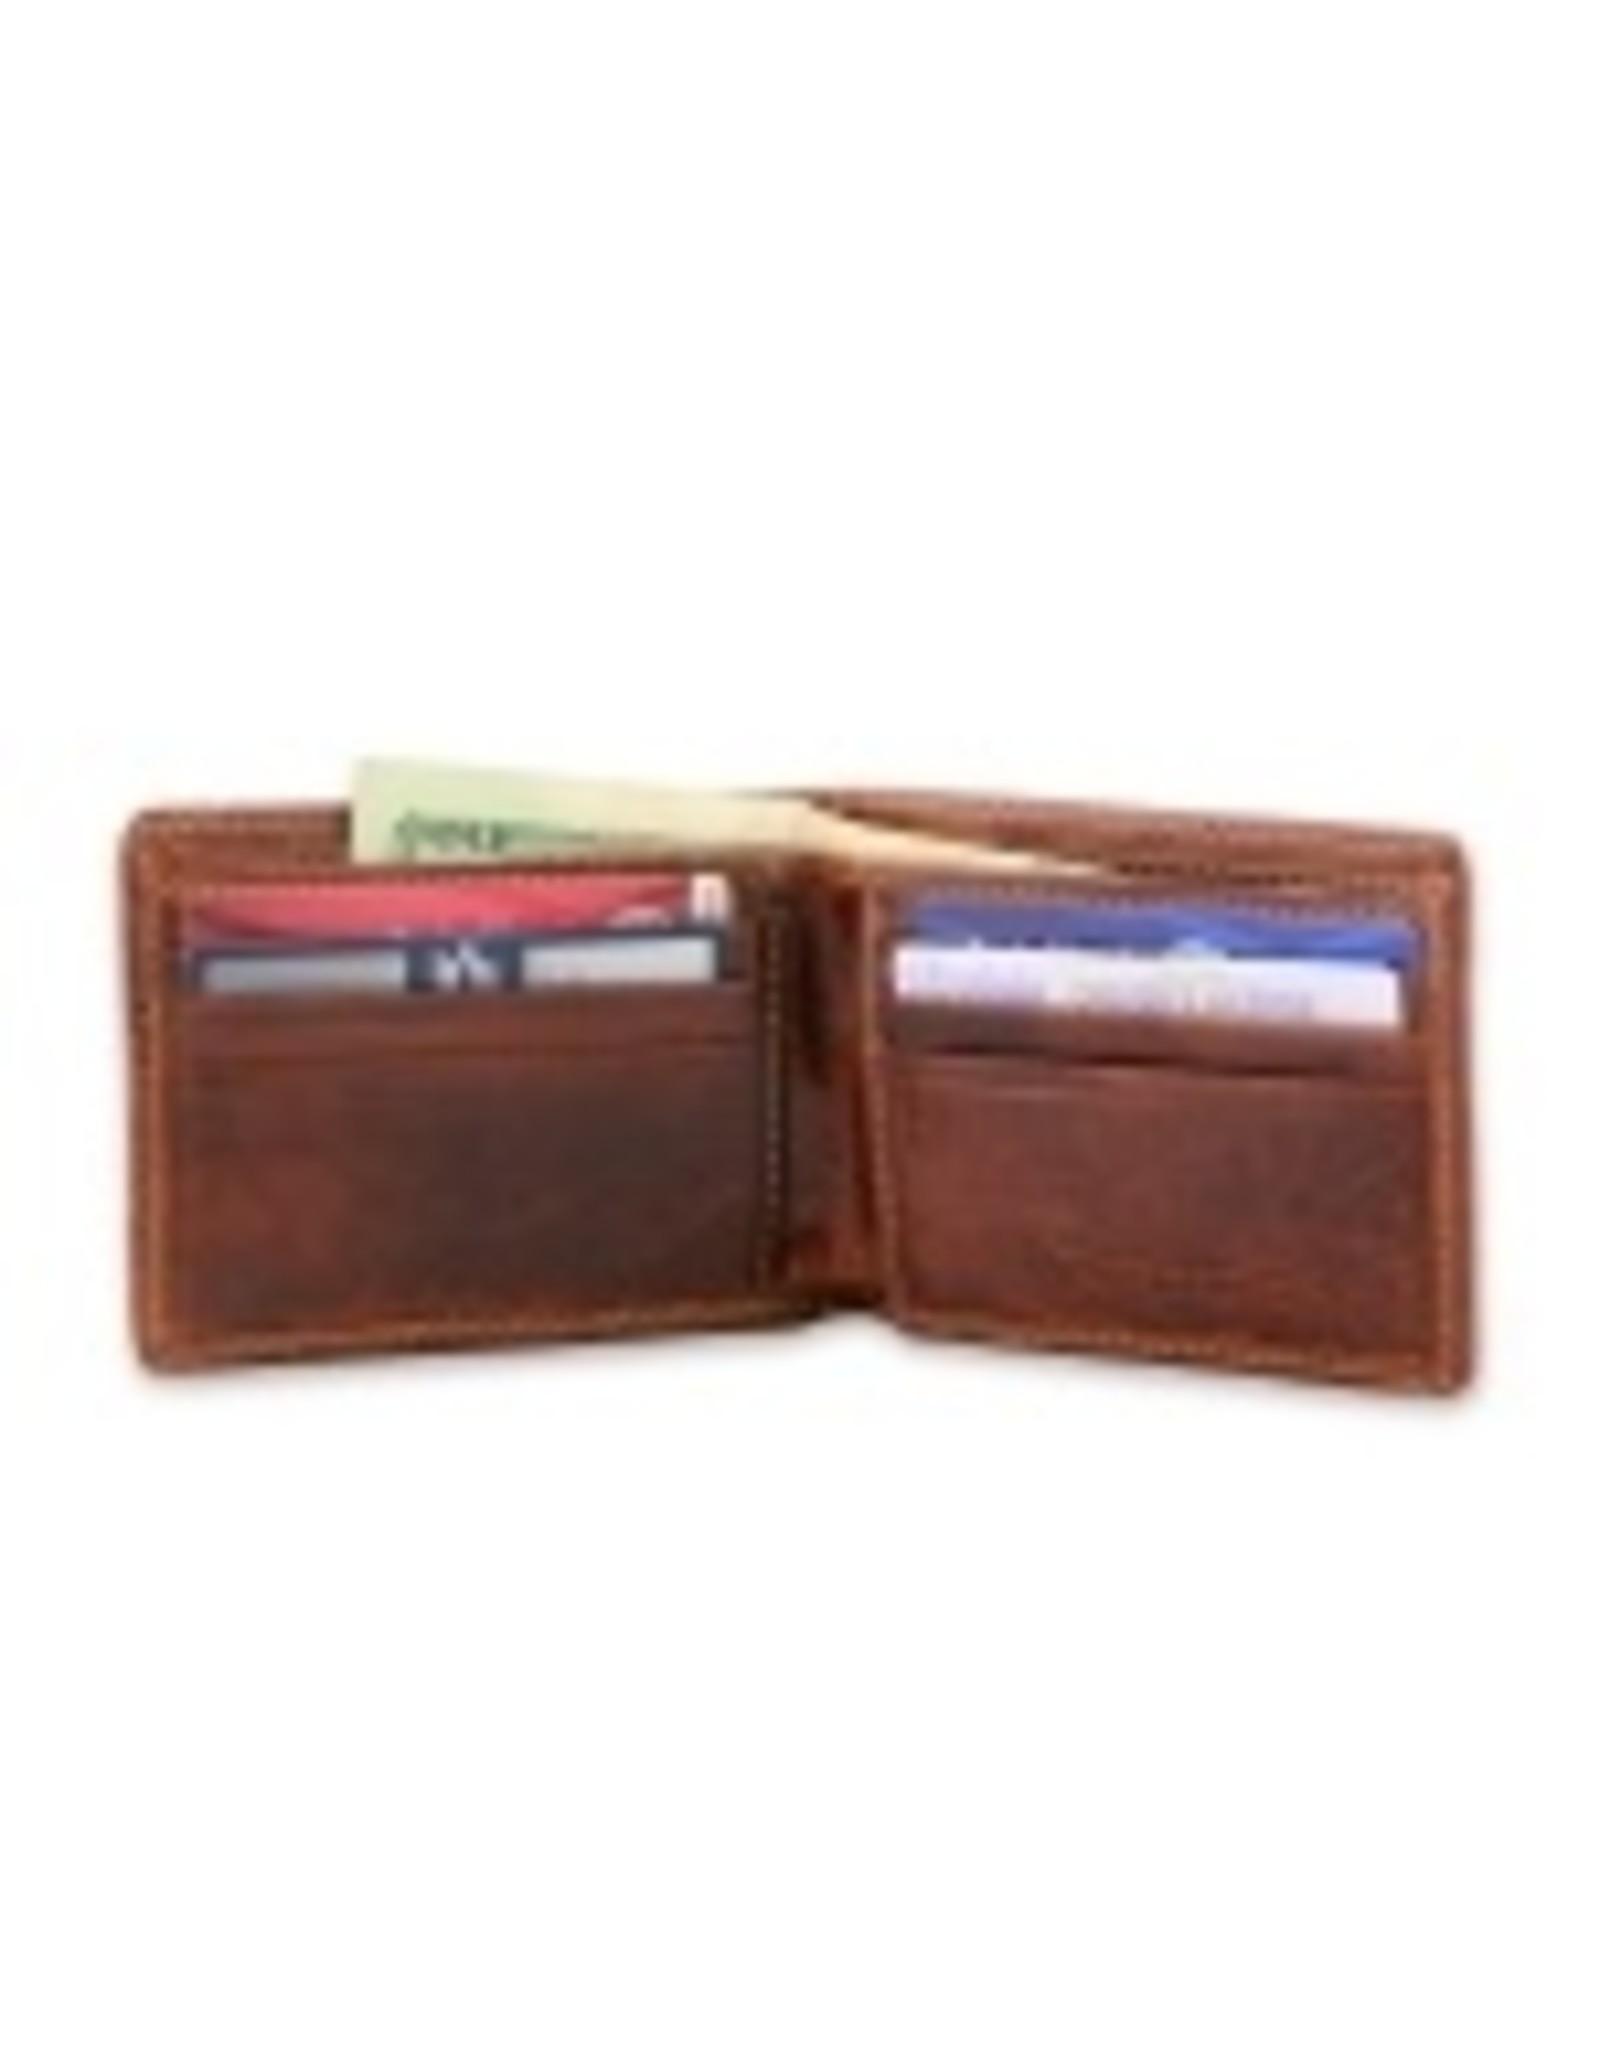 Smathers & Branson S&B Needlepoint Bi-fold Wallet, Crossed Club on classic navy